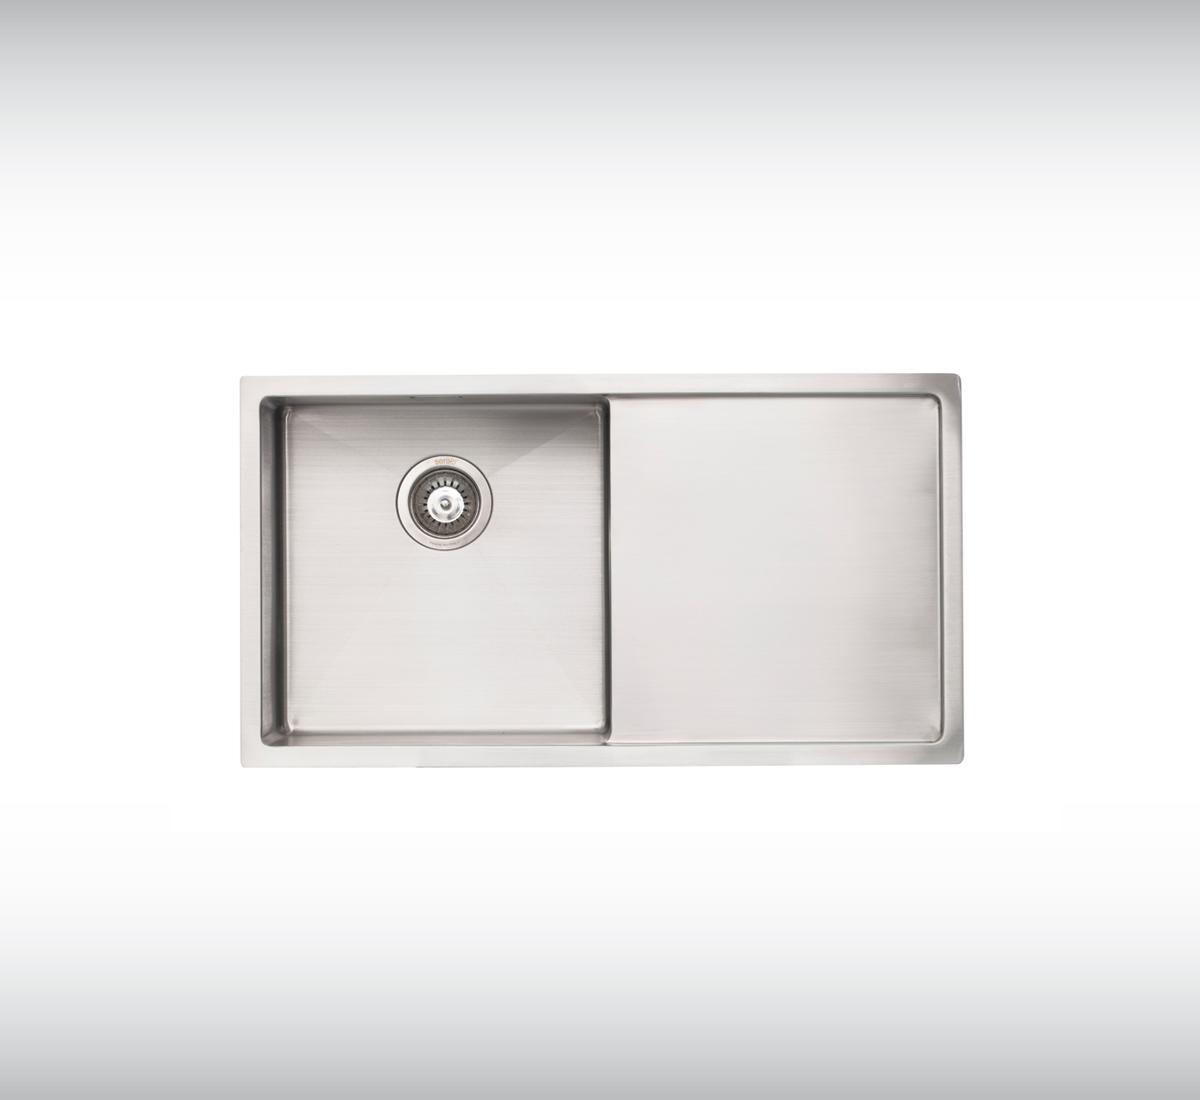 Cabro Sergio Urbane Handmade Stainless Steel Sink UBSH-830RD